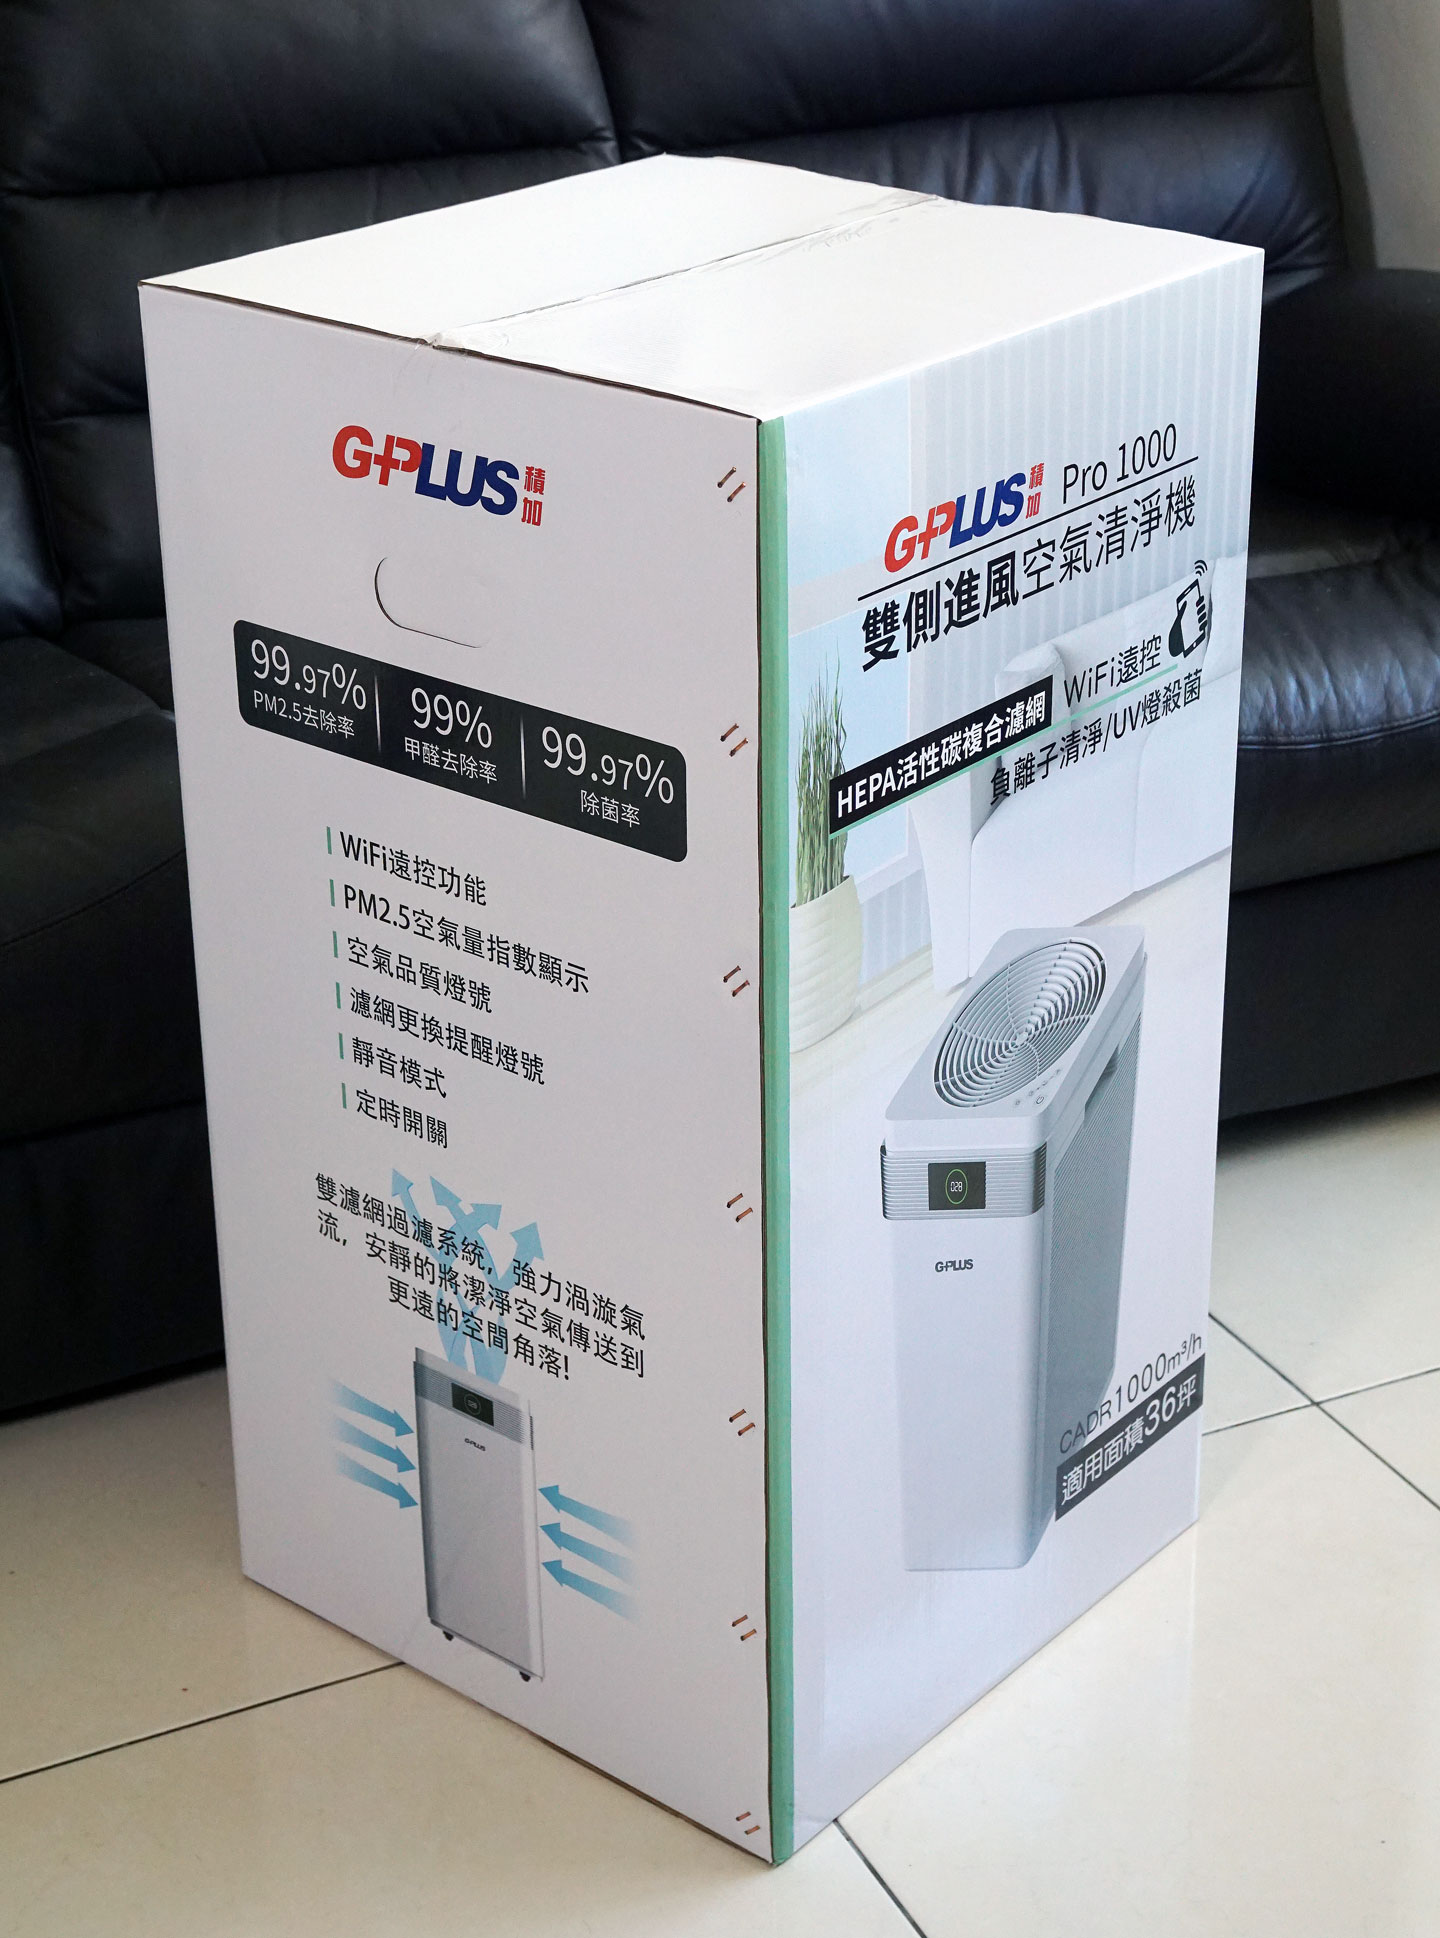 G-Plus Pro 1000 的外箱為彩色印刷設計,看起來十分精美,除了產品實機圖,也有大量的產品特色介紹。